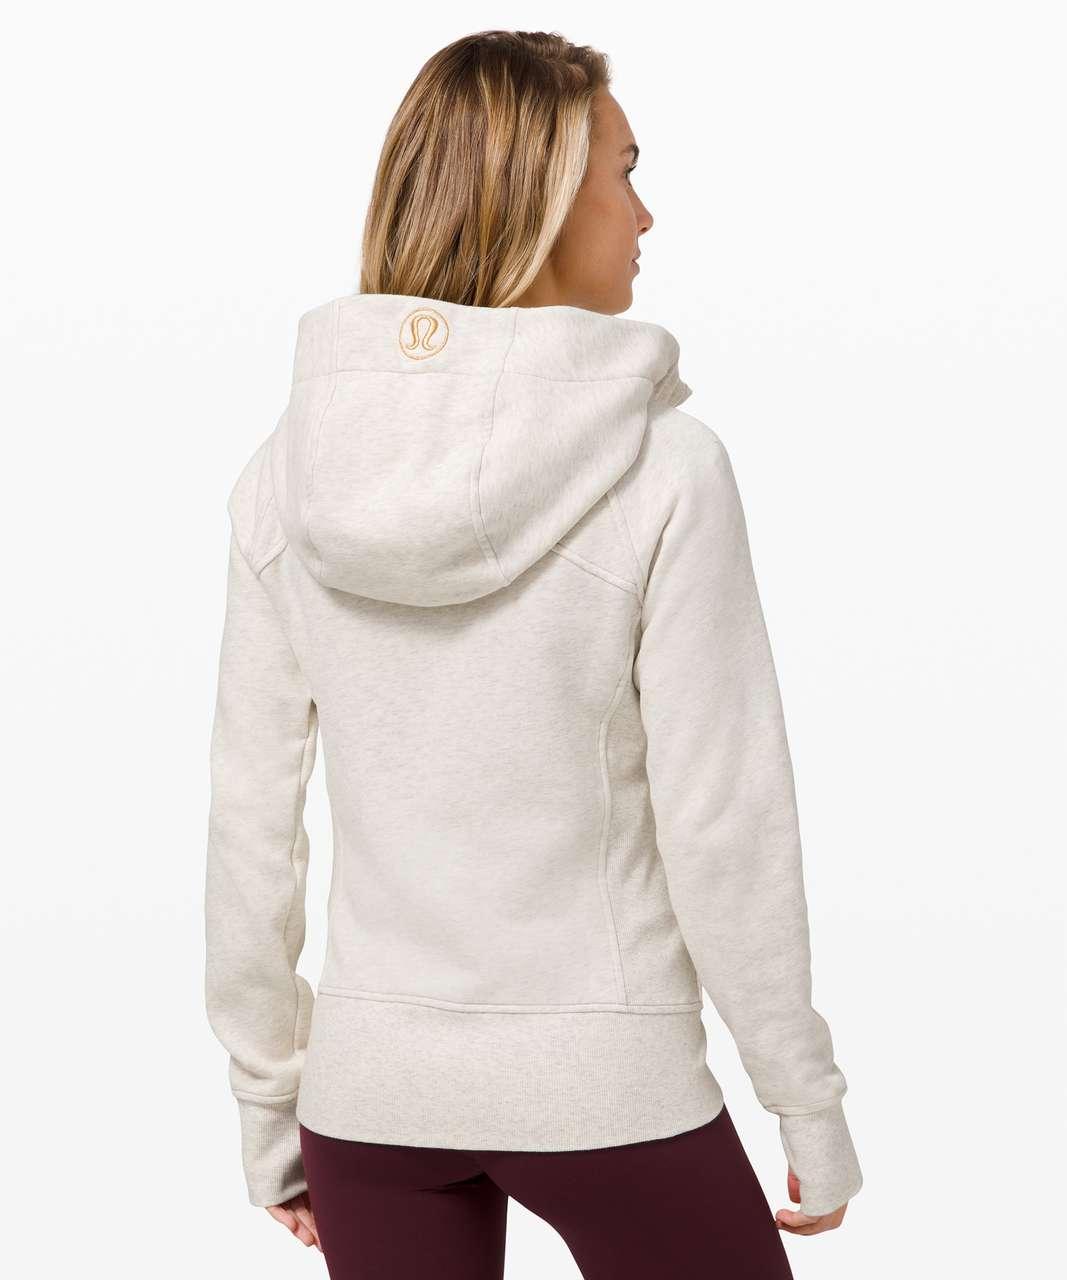 Lululemon Scuba Hoodie Gold *Light Cotton Fleece - Heathered Light Ivory / Gold